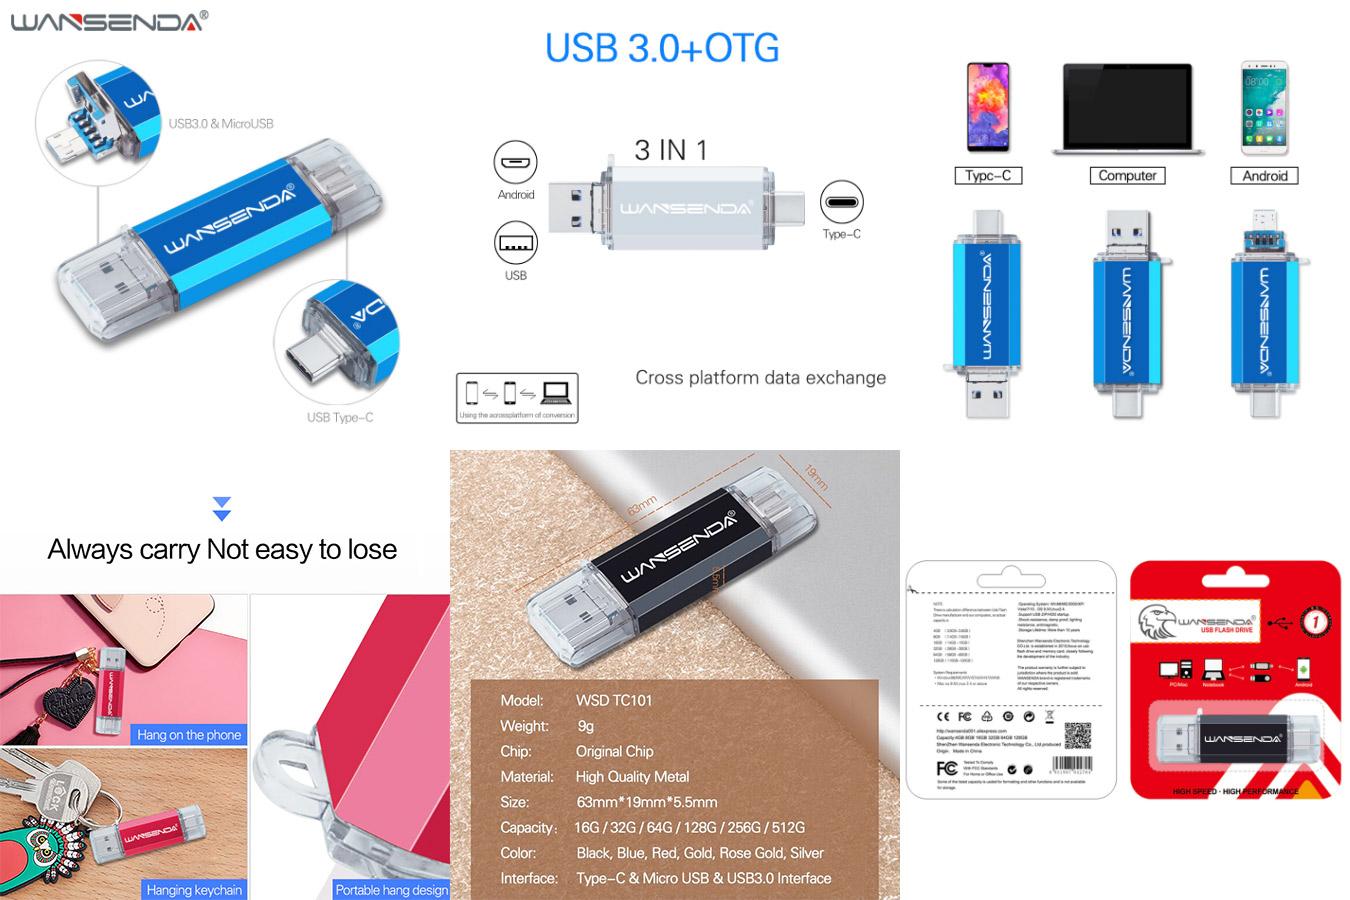 Многофункциональная флешка WANSENDA 3 in 1 OTG USB Flash drive USB 3.0 & type-C